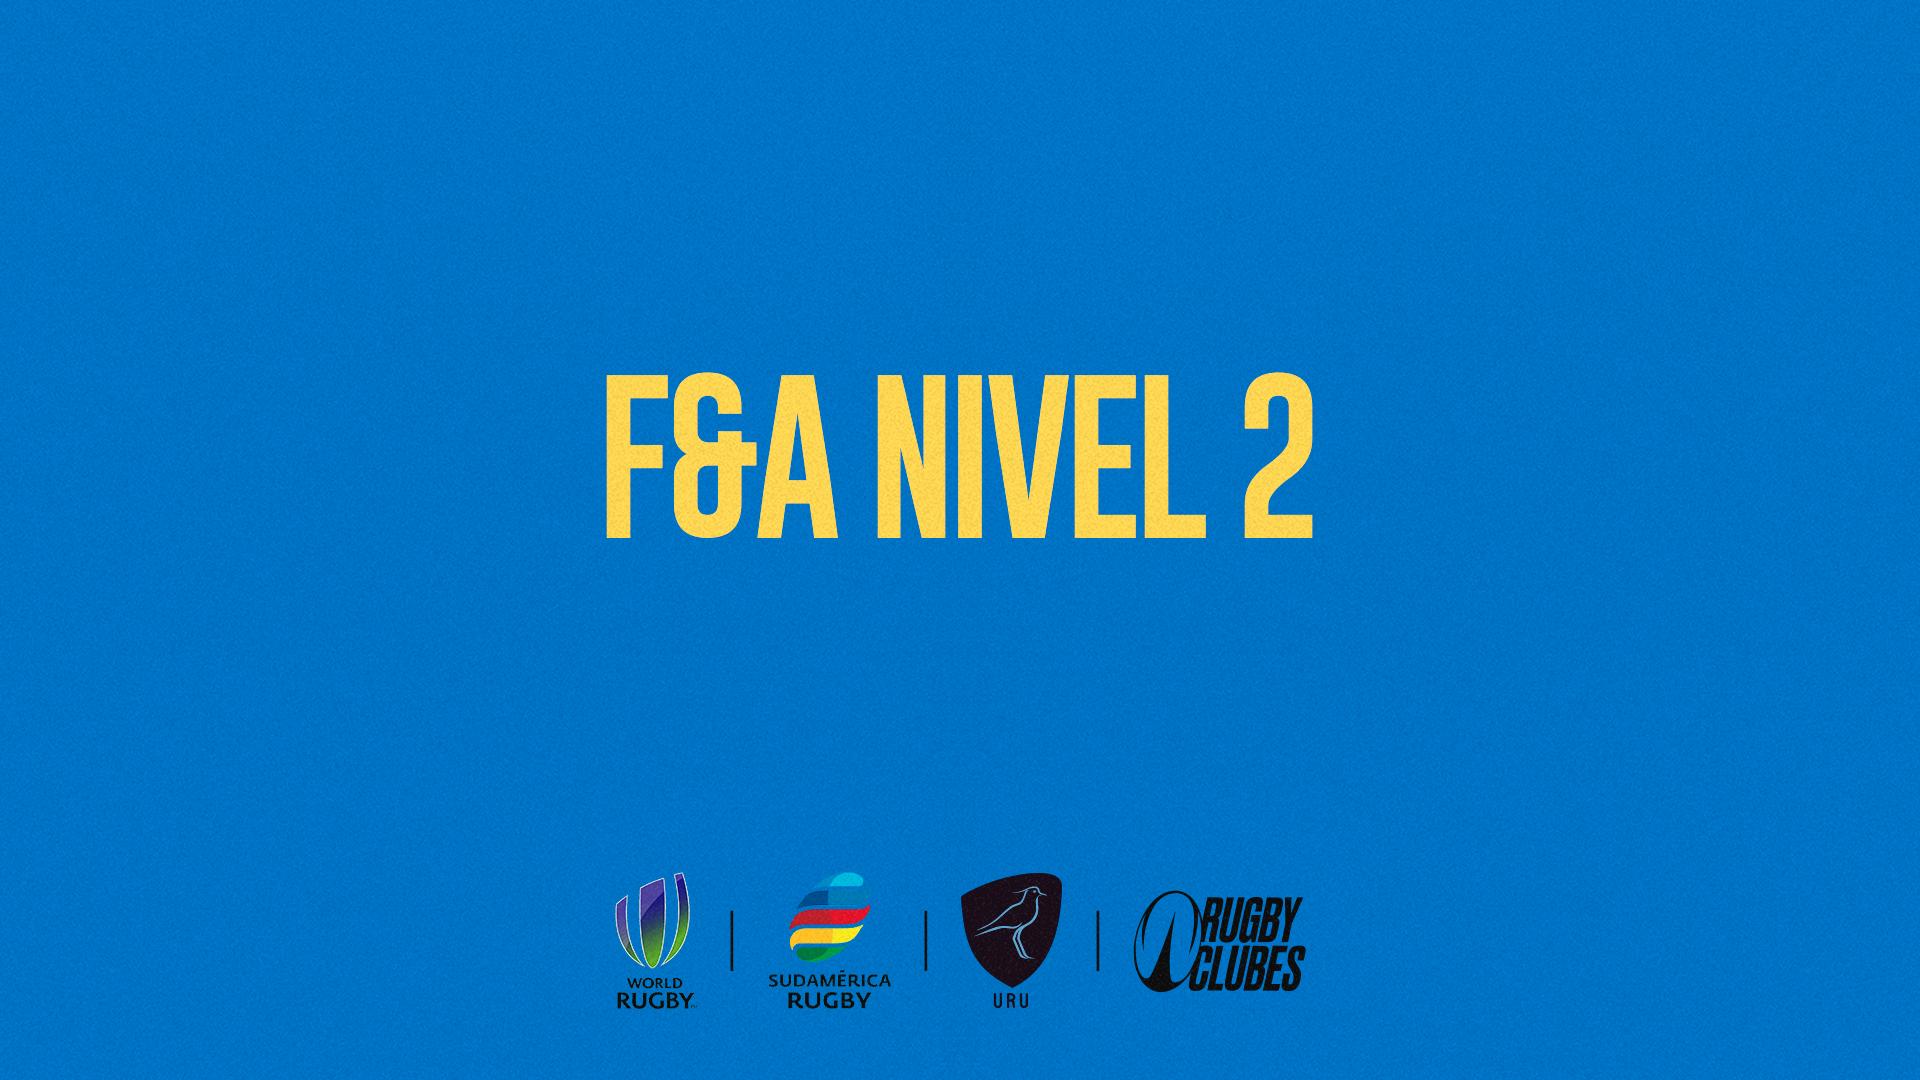 F&A Nivel 2